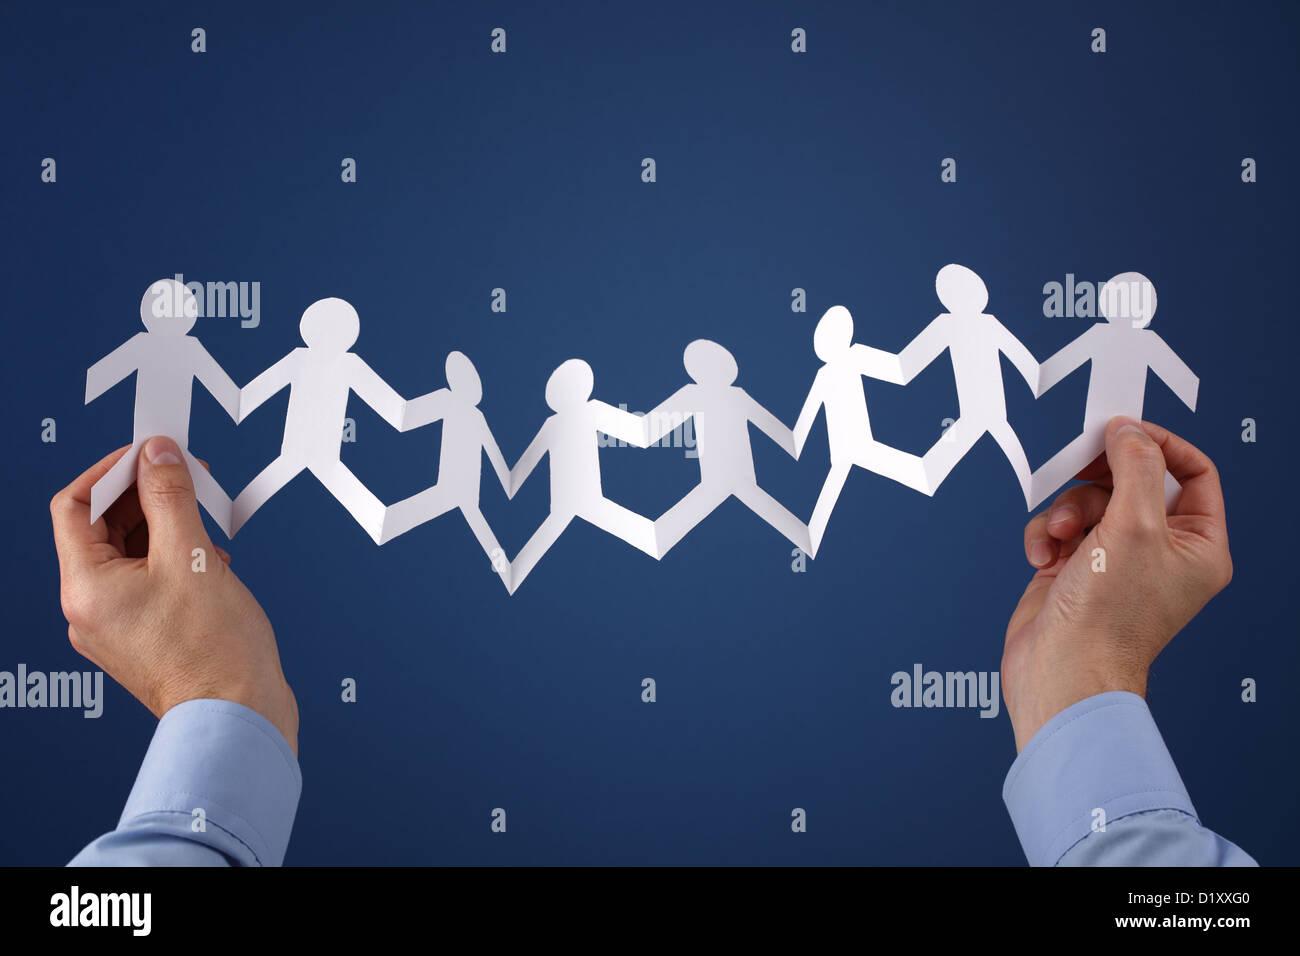 Teamwork - Stock Image